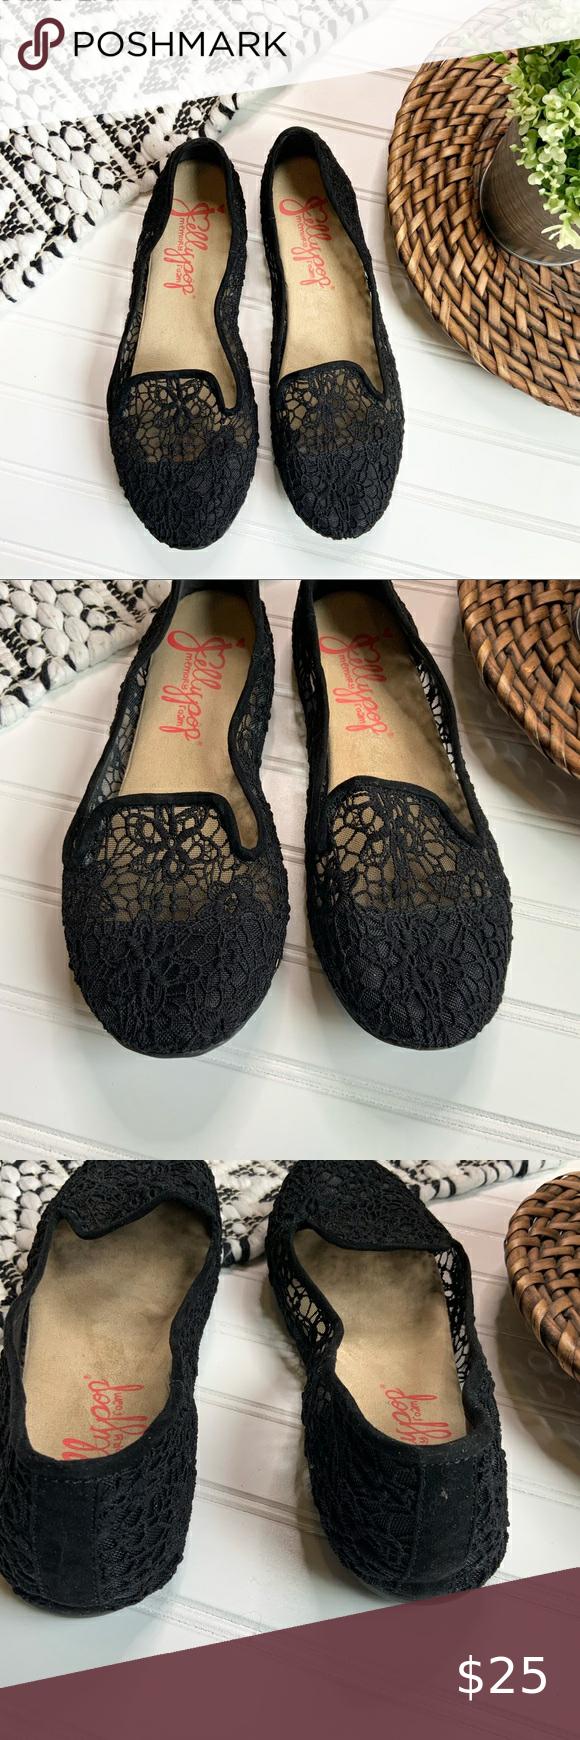 jellypop black lace flats